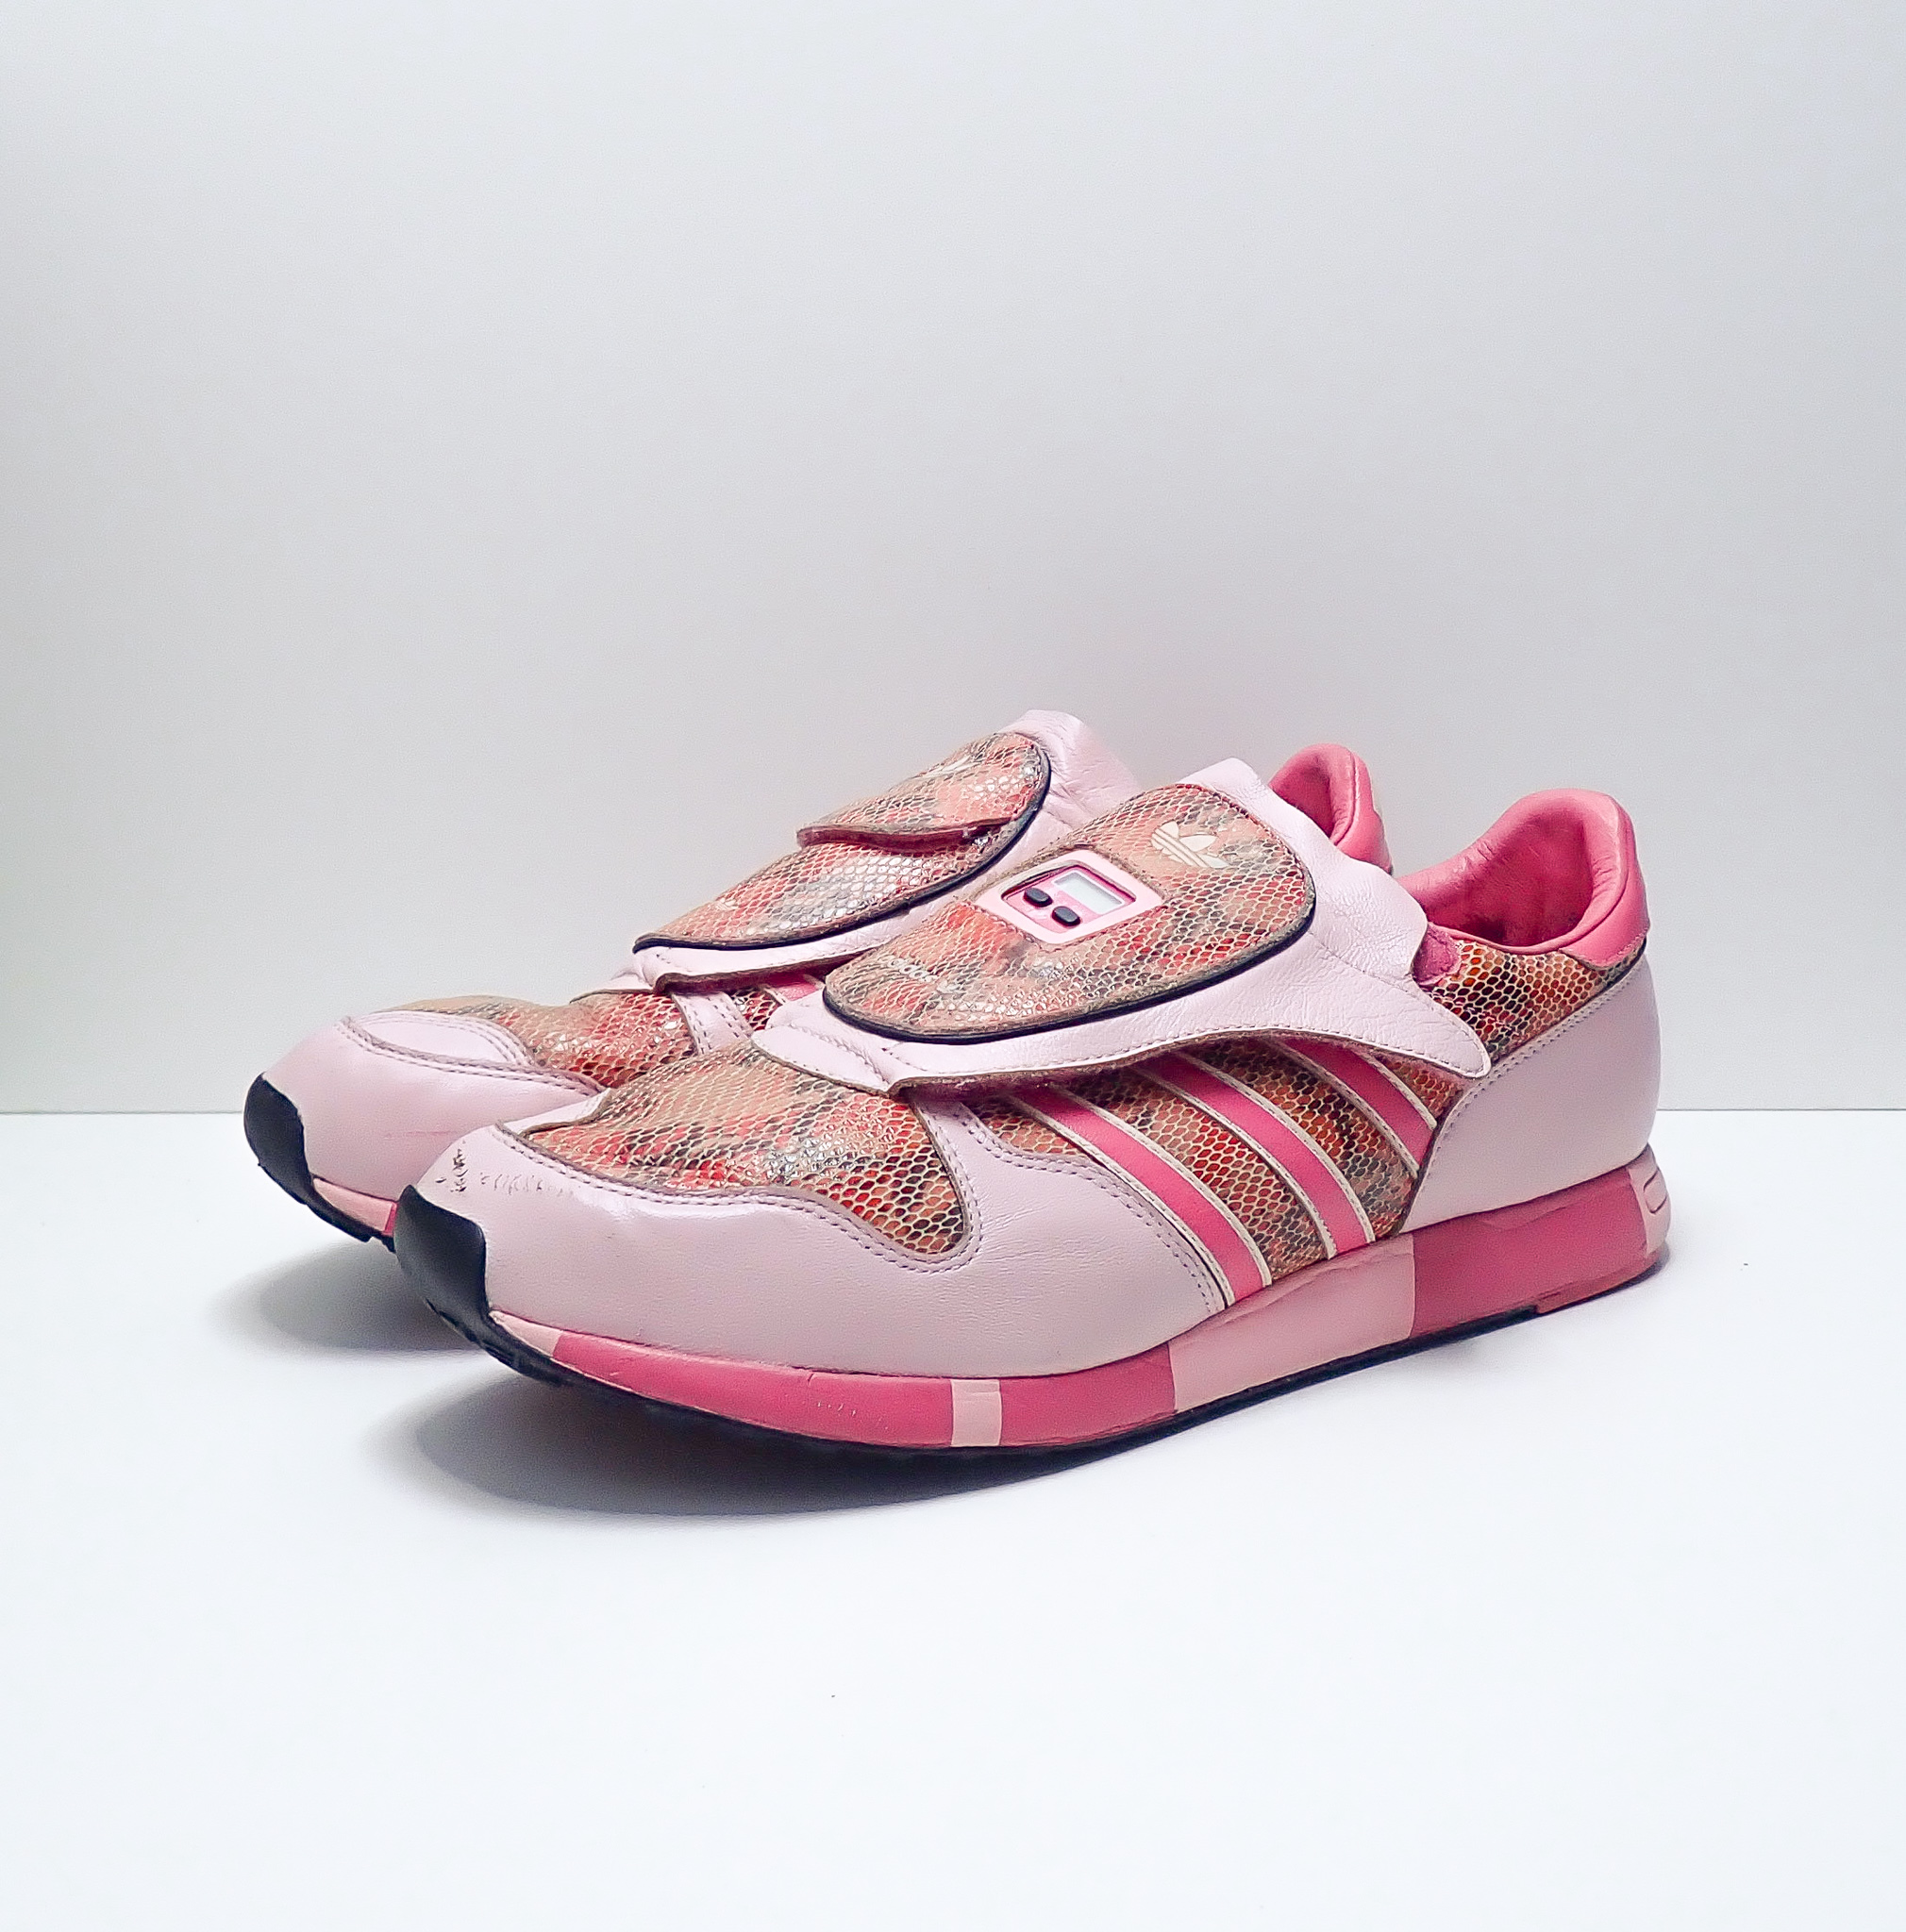 Adidas Micropacer Snakeskin